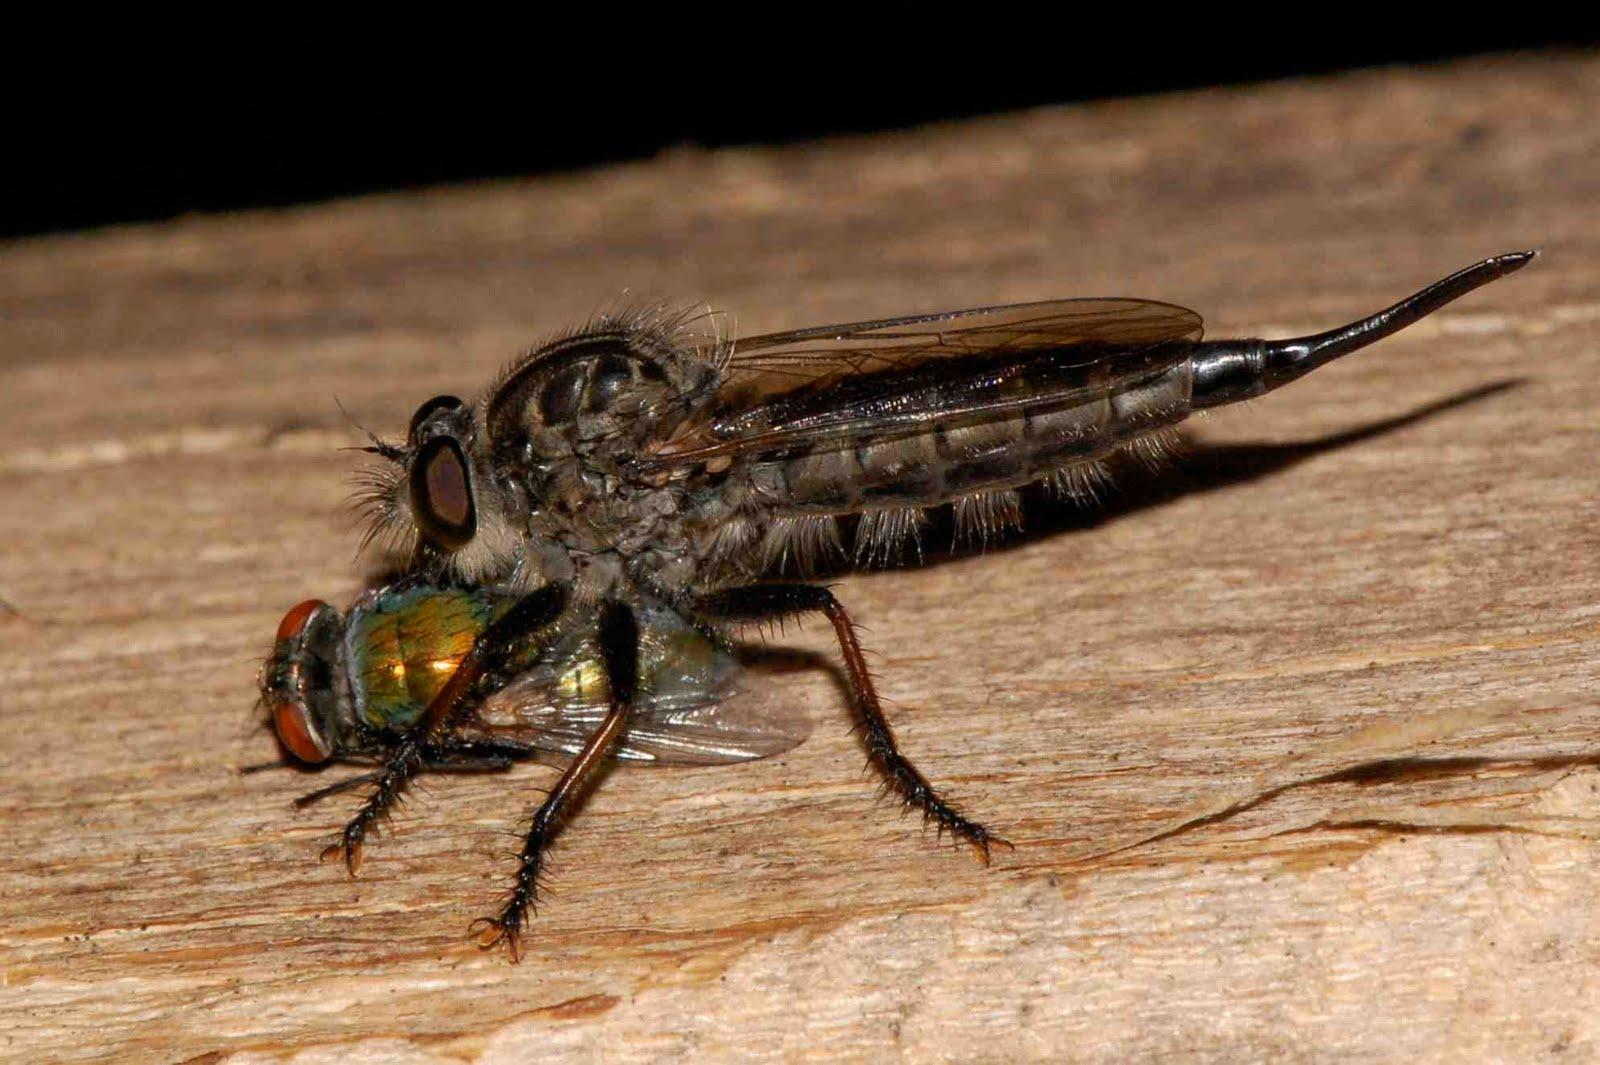 What Do Flies Eat?